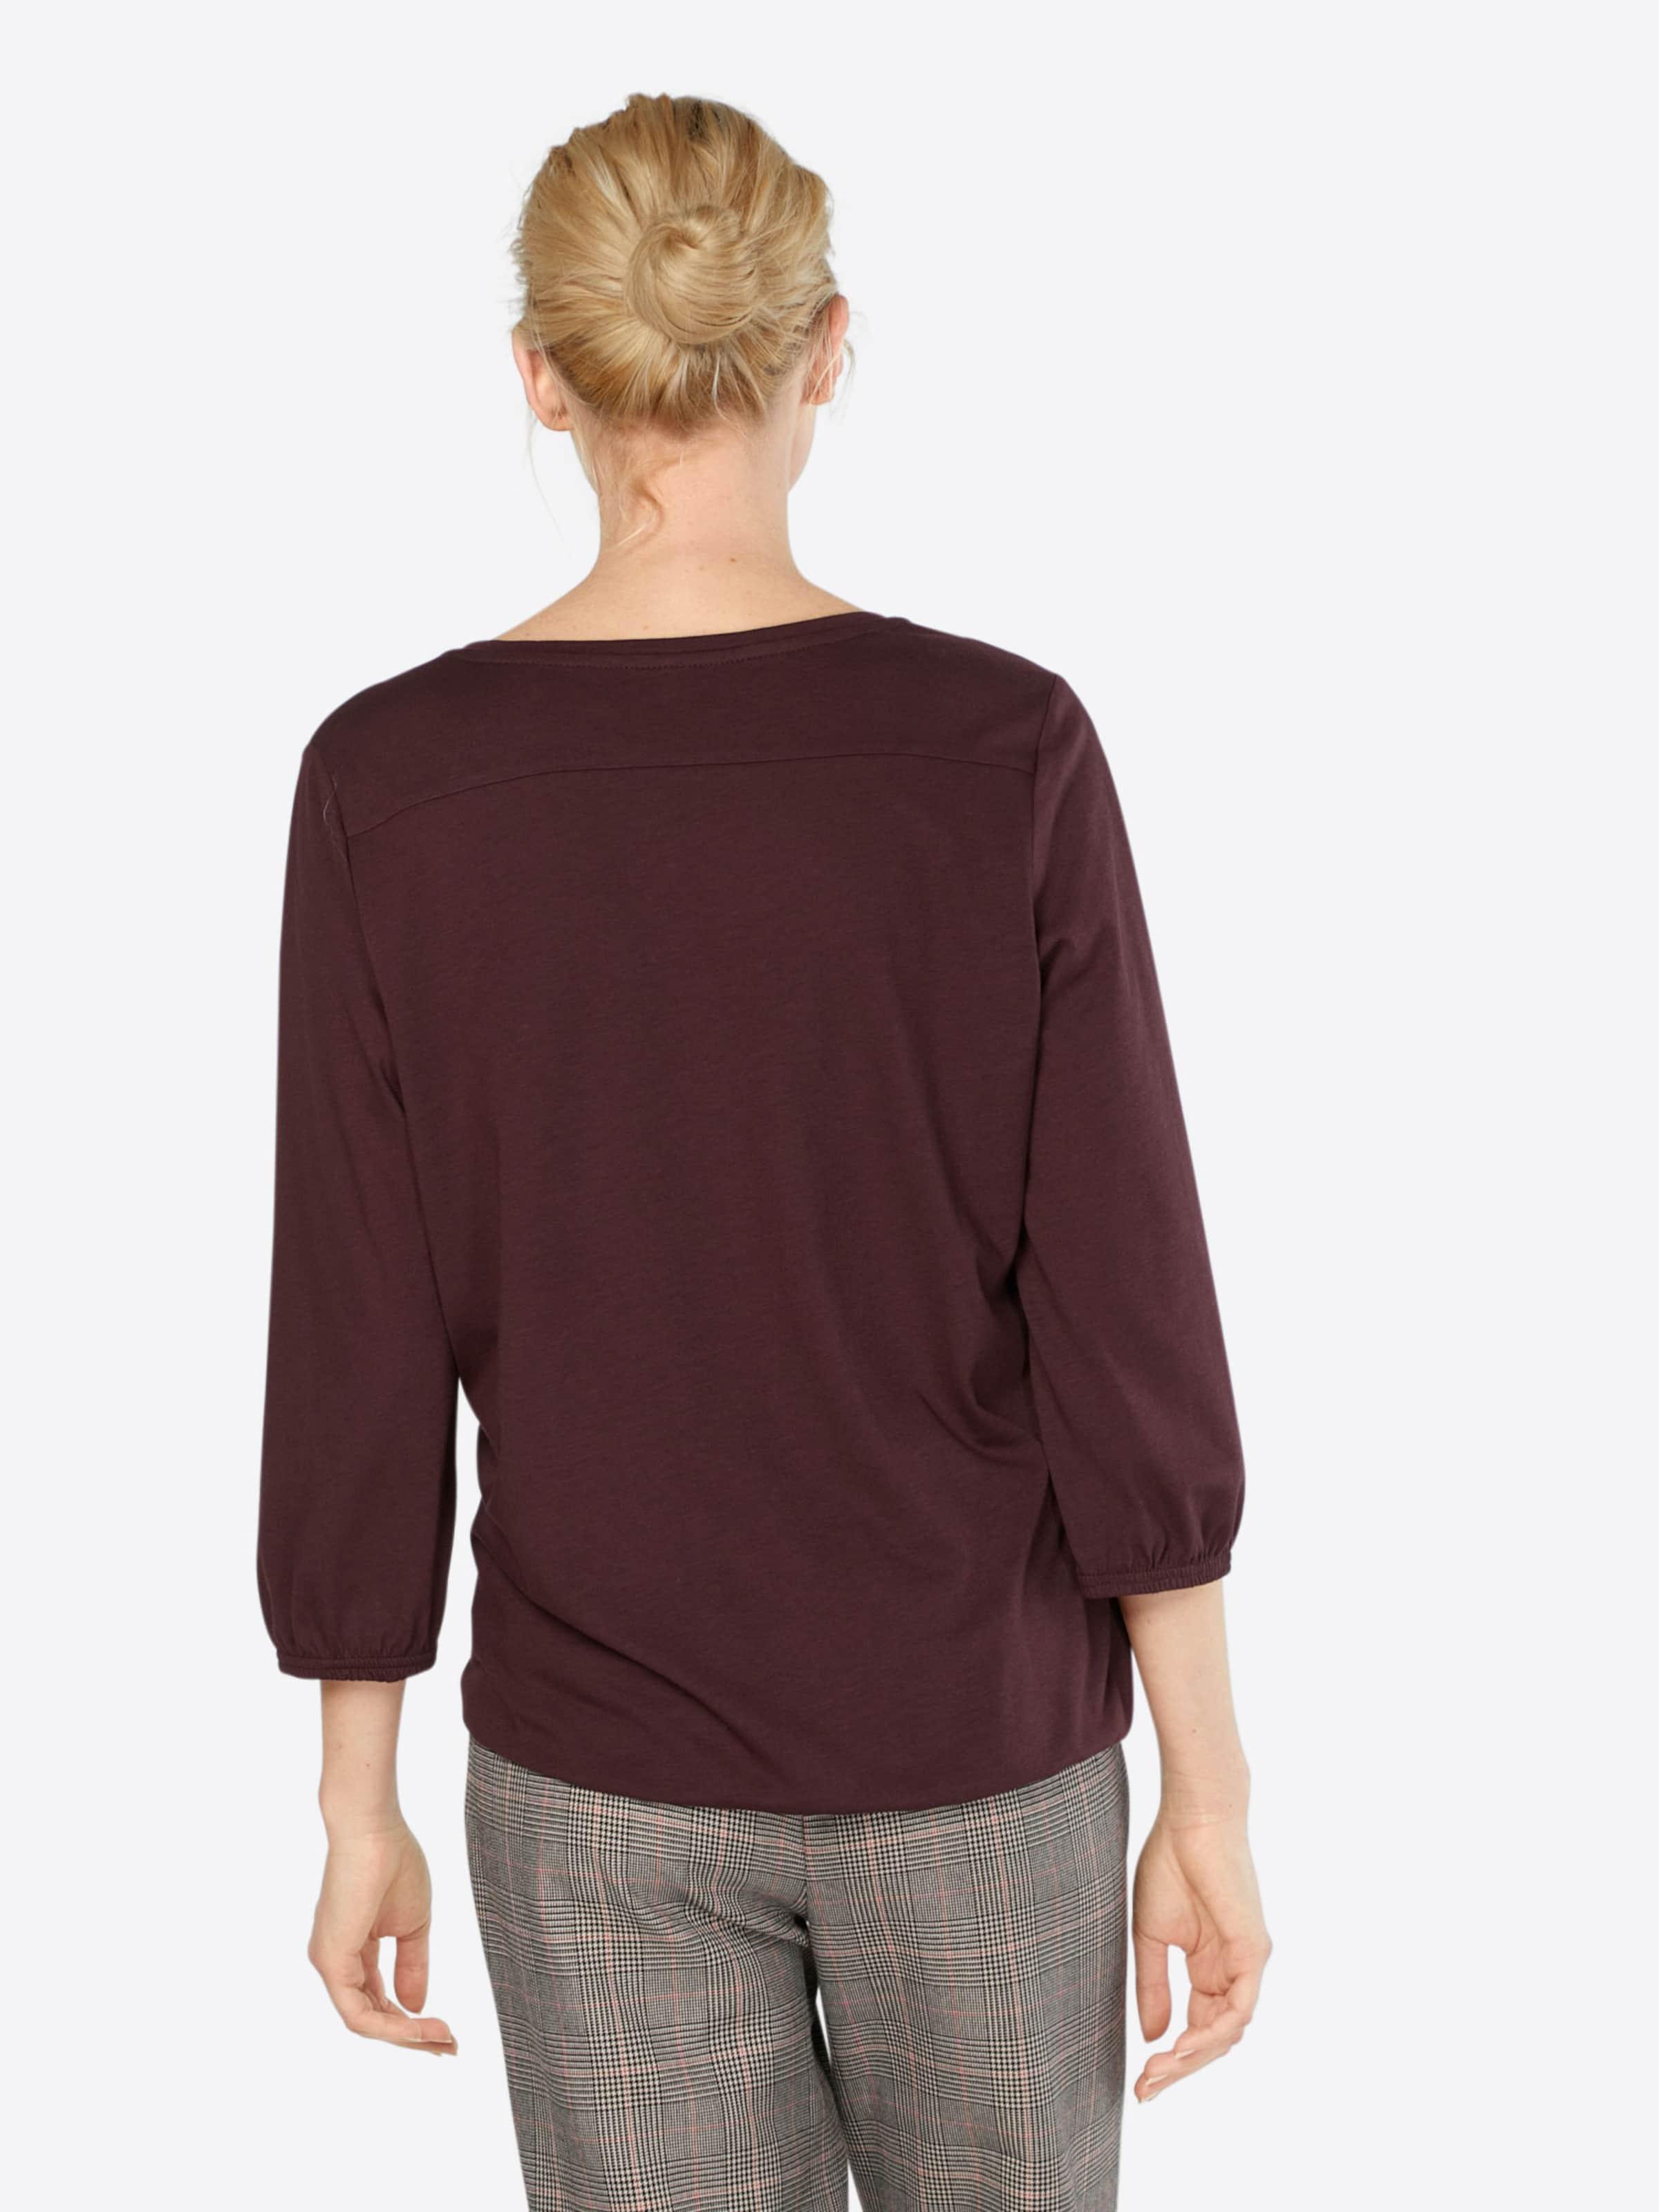 Shirt 'sc Soyaconcept felicity 7' In Bordeaux uKTc35lF1J